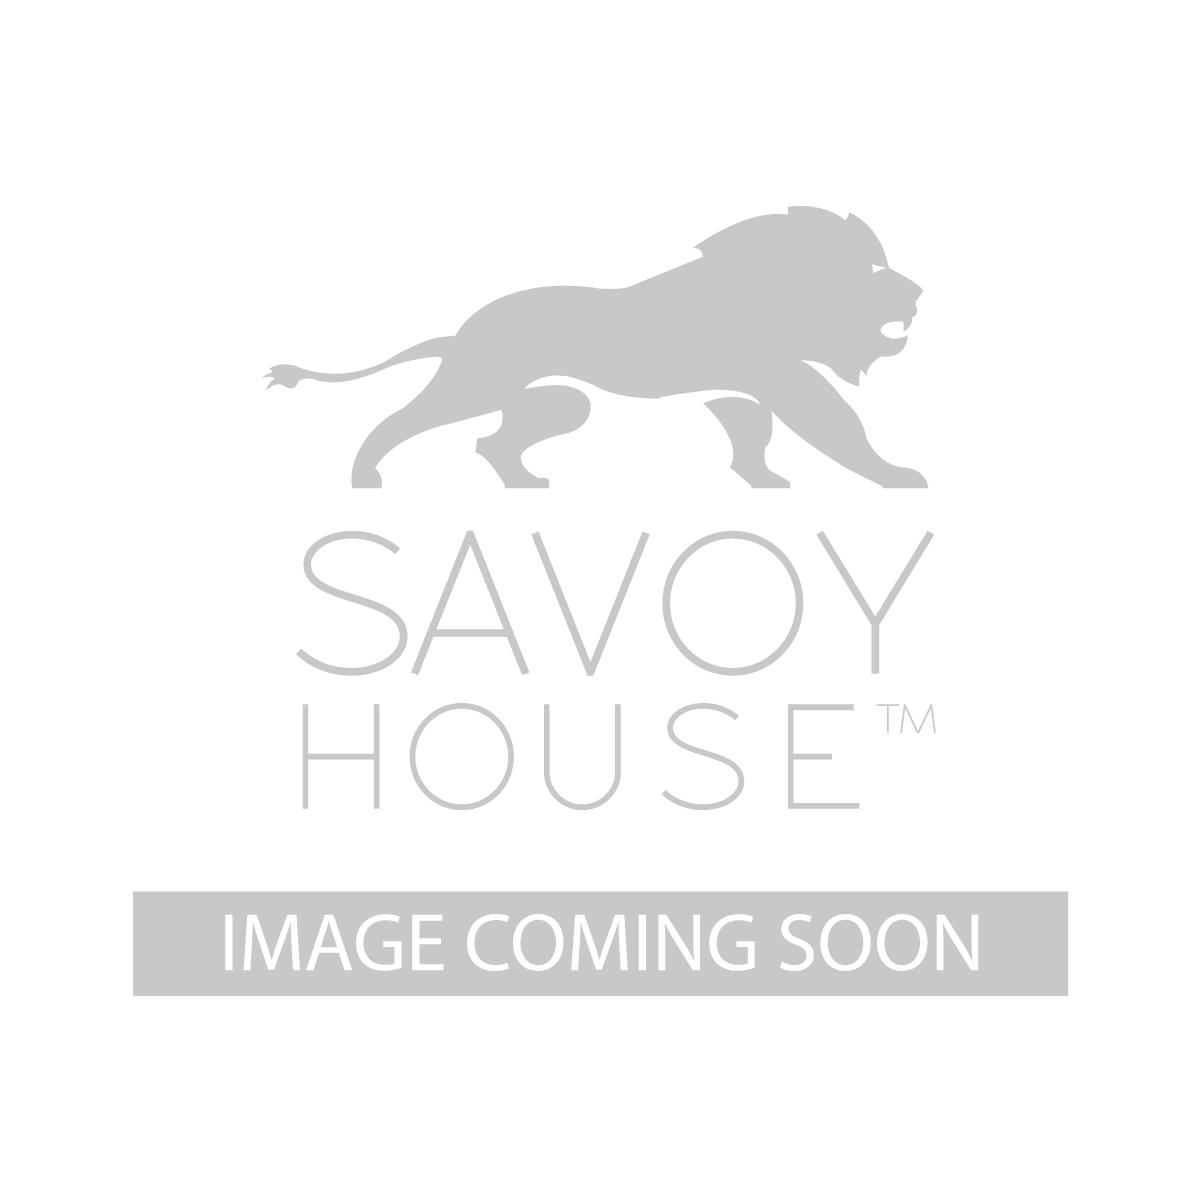 7 4387 1 Sn Hagen Mini Pendant By Savoy House